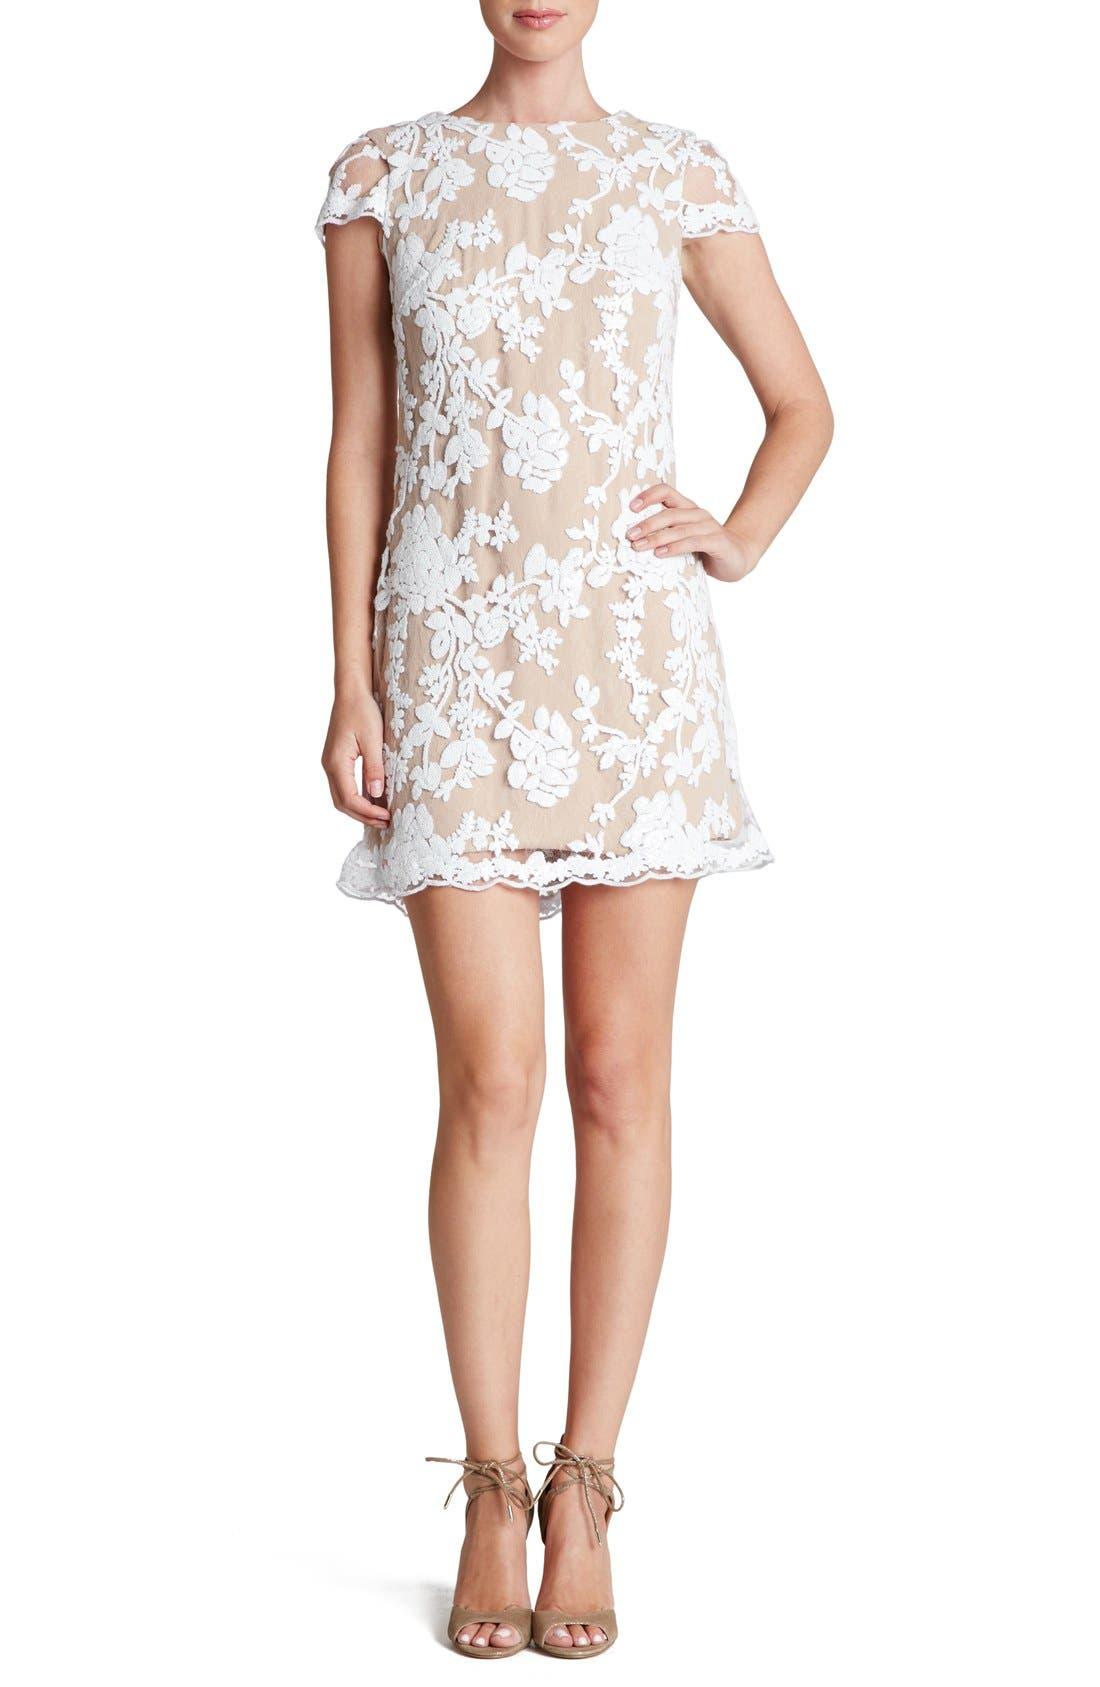 Alternate Image 1 Selected - Dress the Population 'Hope' Lace Sheath Dress